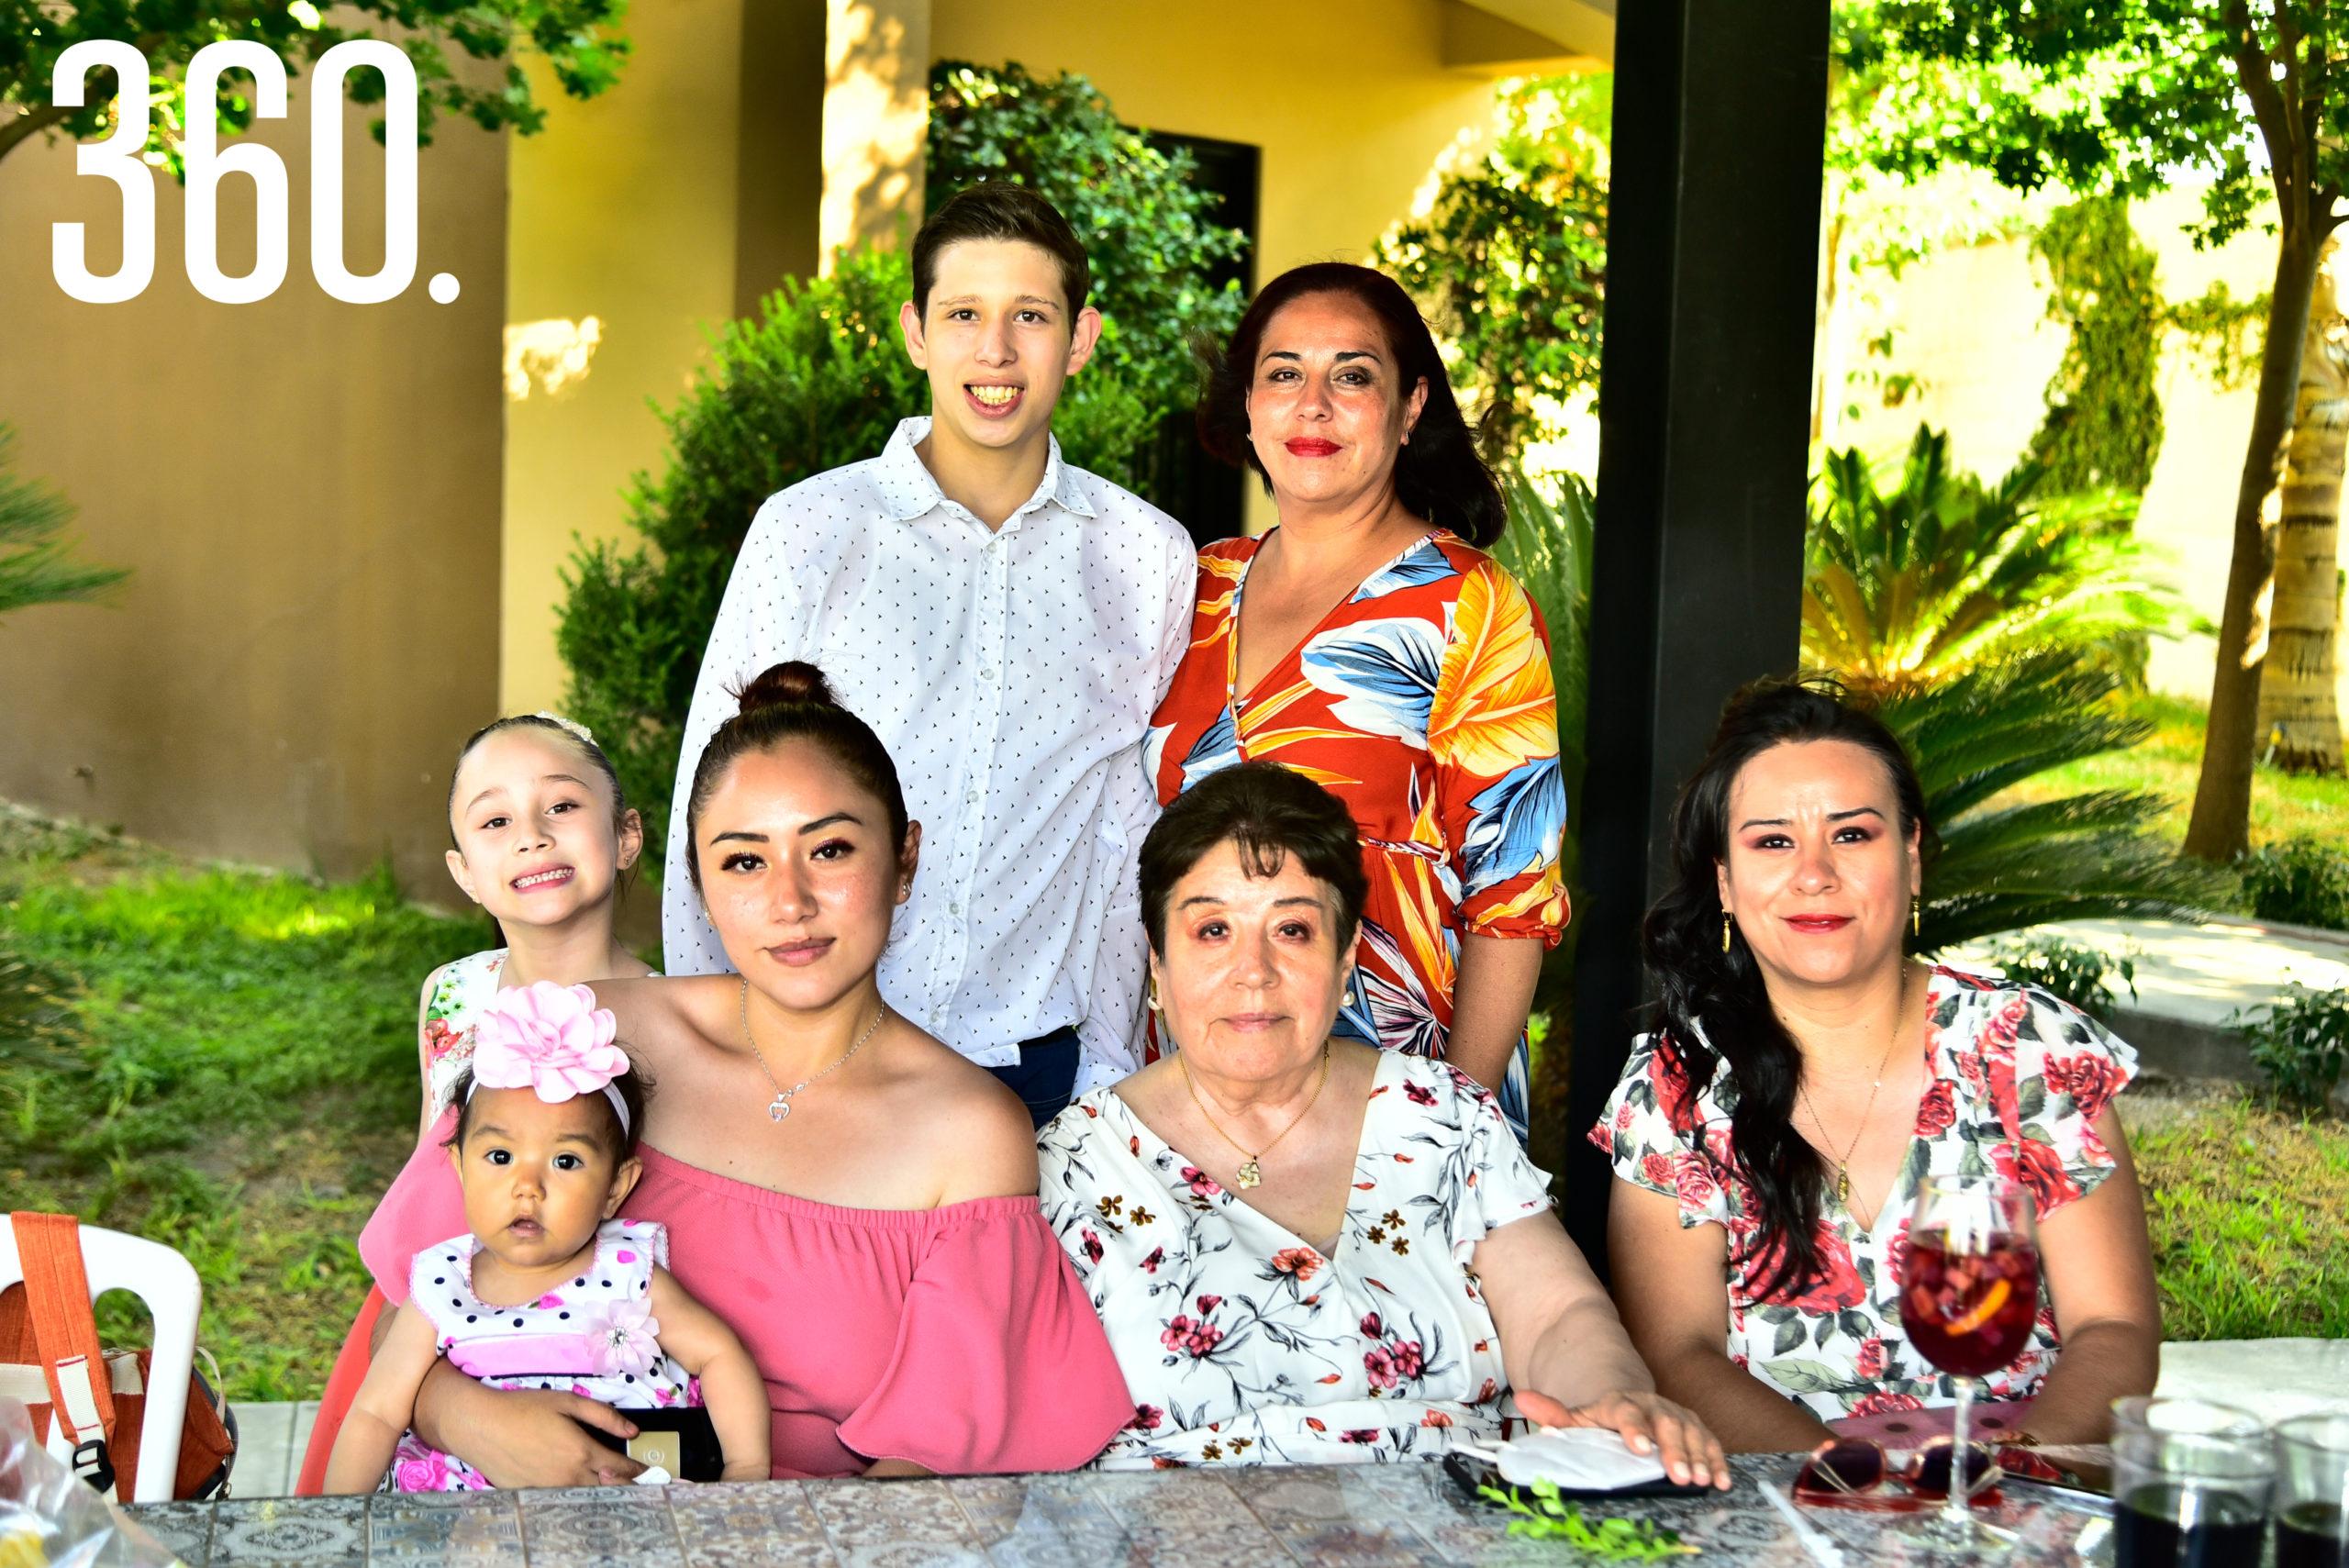 Rommel Valenzuela, Liliana Martínez, Iranís Valenzuela, Ángela Solís, Liliana Valenzuela, María Beatriz y Daniela de la Paz.